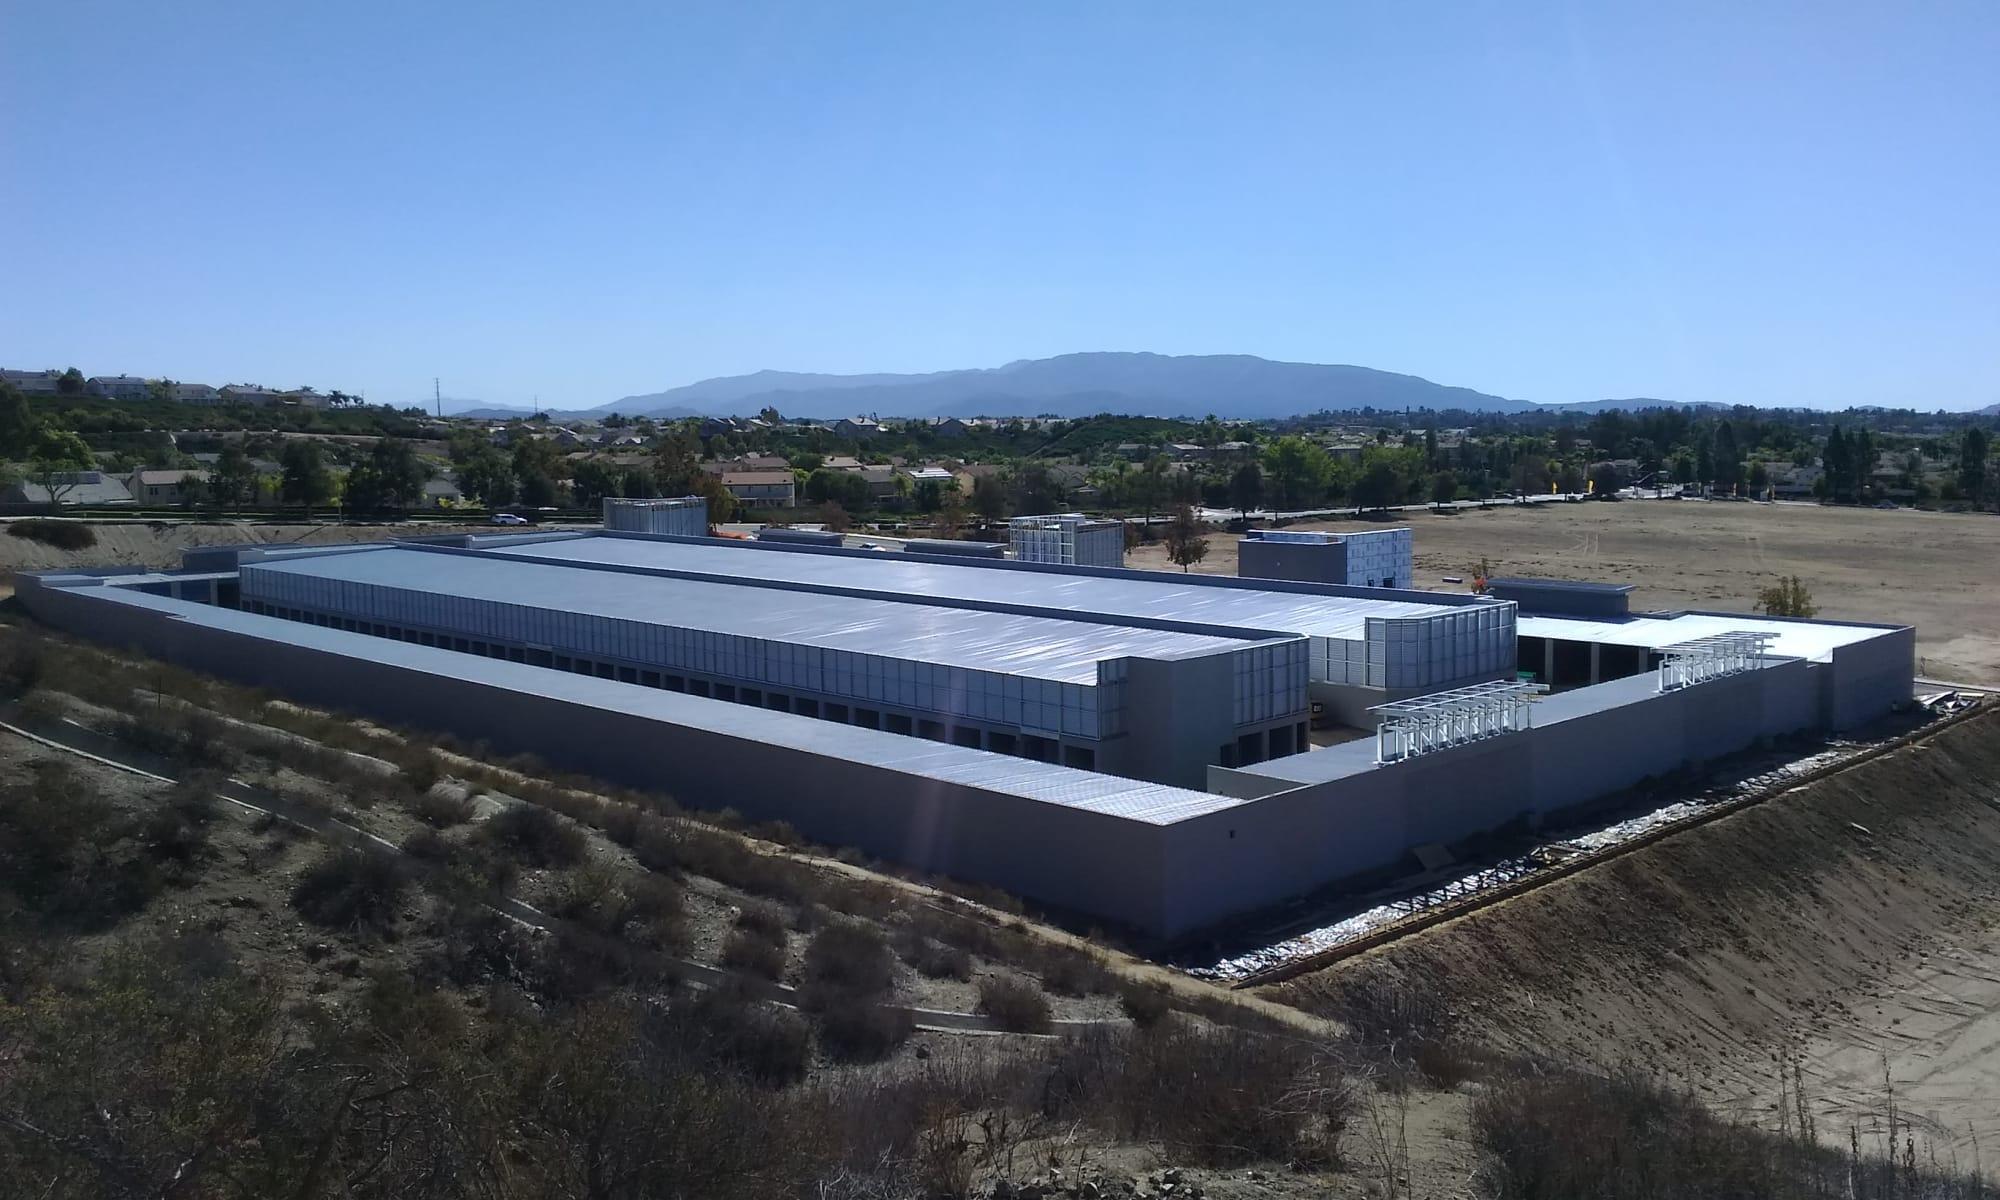 Silverhawk Self Storage in Murrieta, California is home to the 1st Year Price Guarantee.